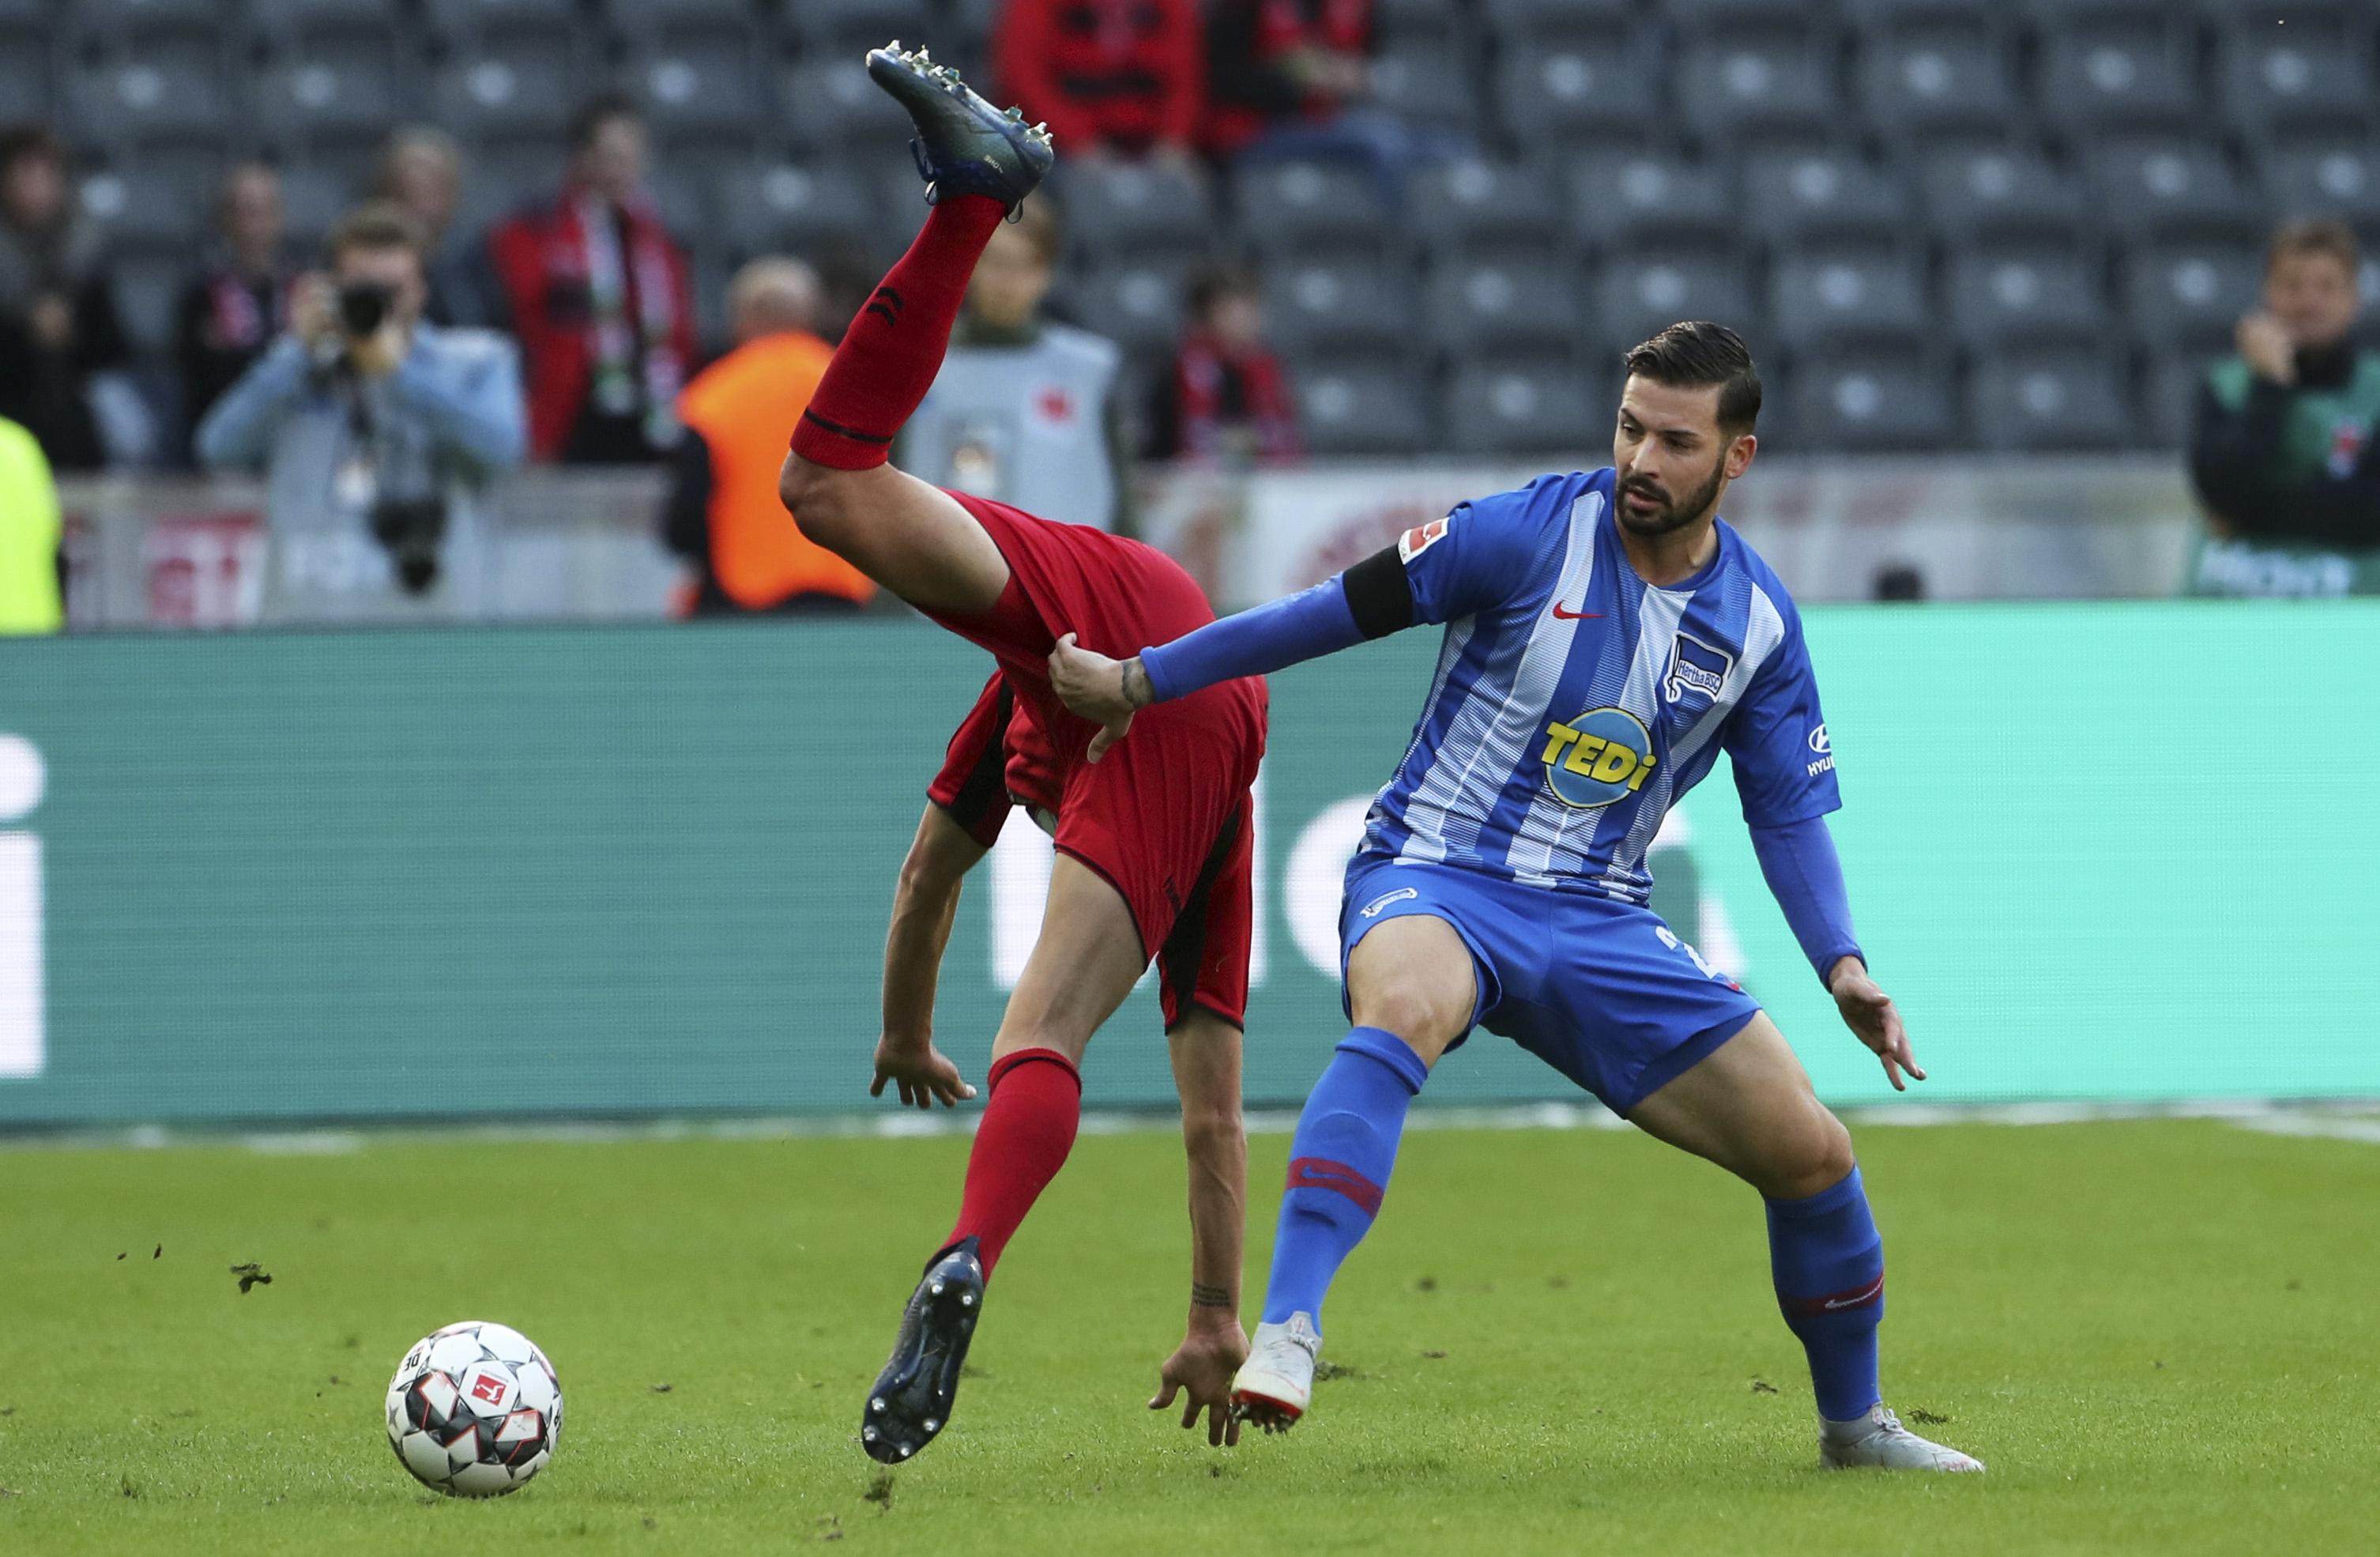 Hertha held by Freiburg after VAR overturns penalty award